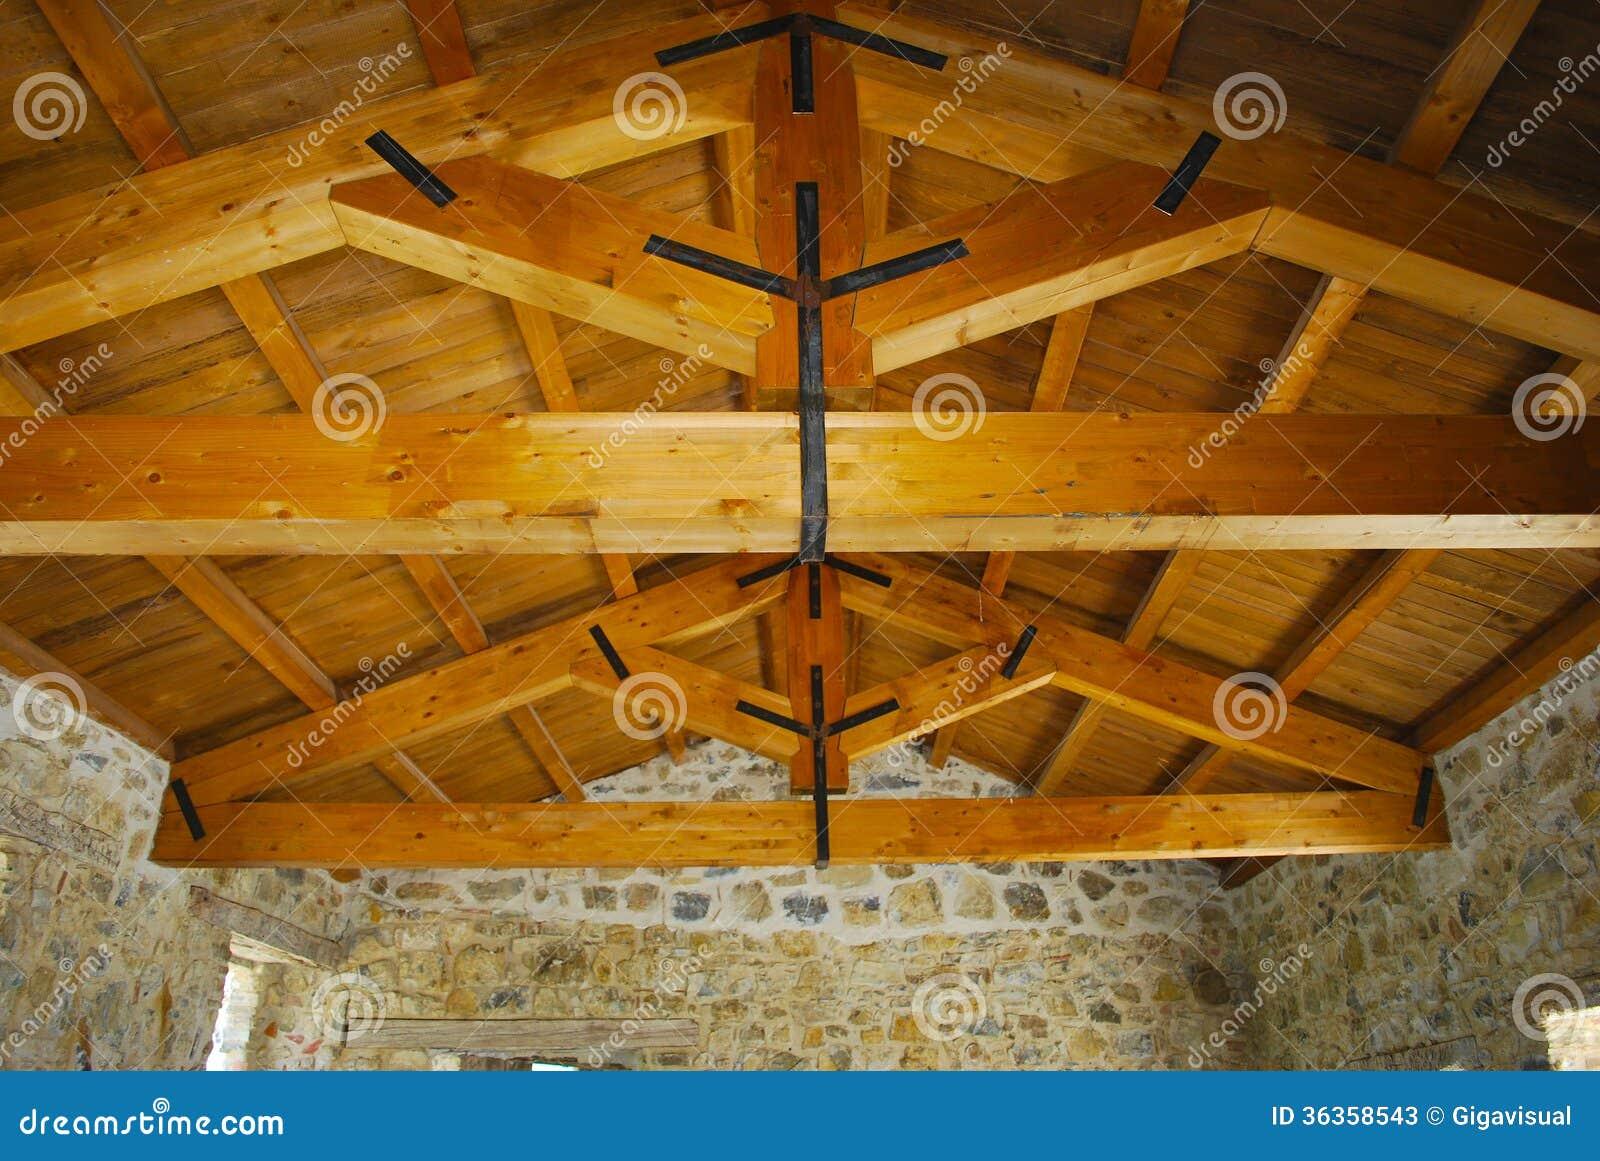 Wood beams stock image image of sostegno durable eterno for Illuminazione travi a vista